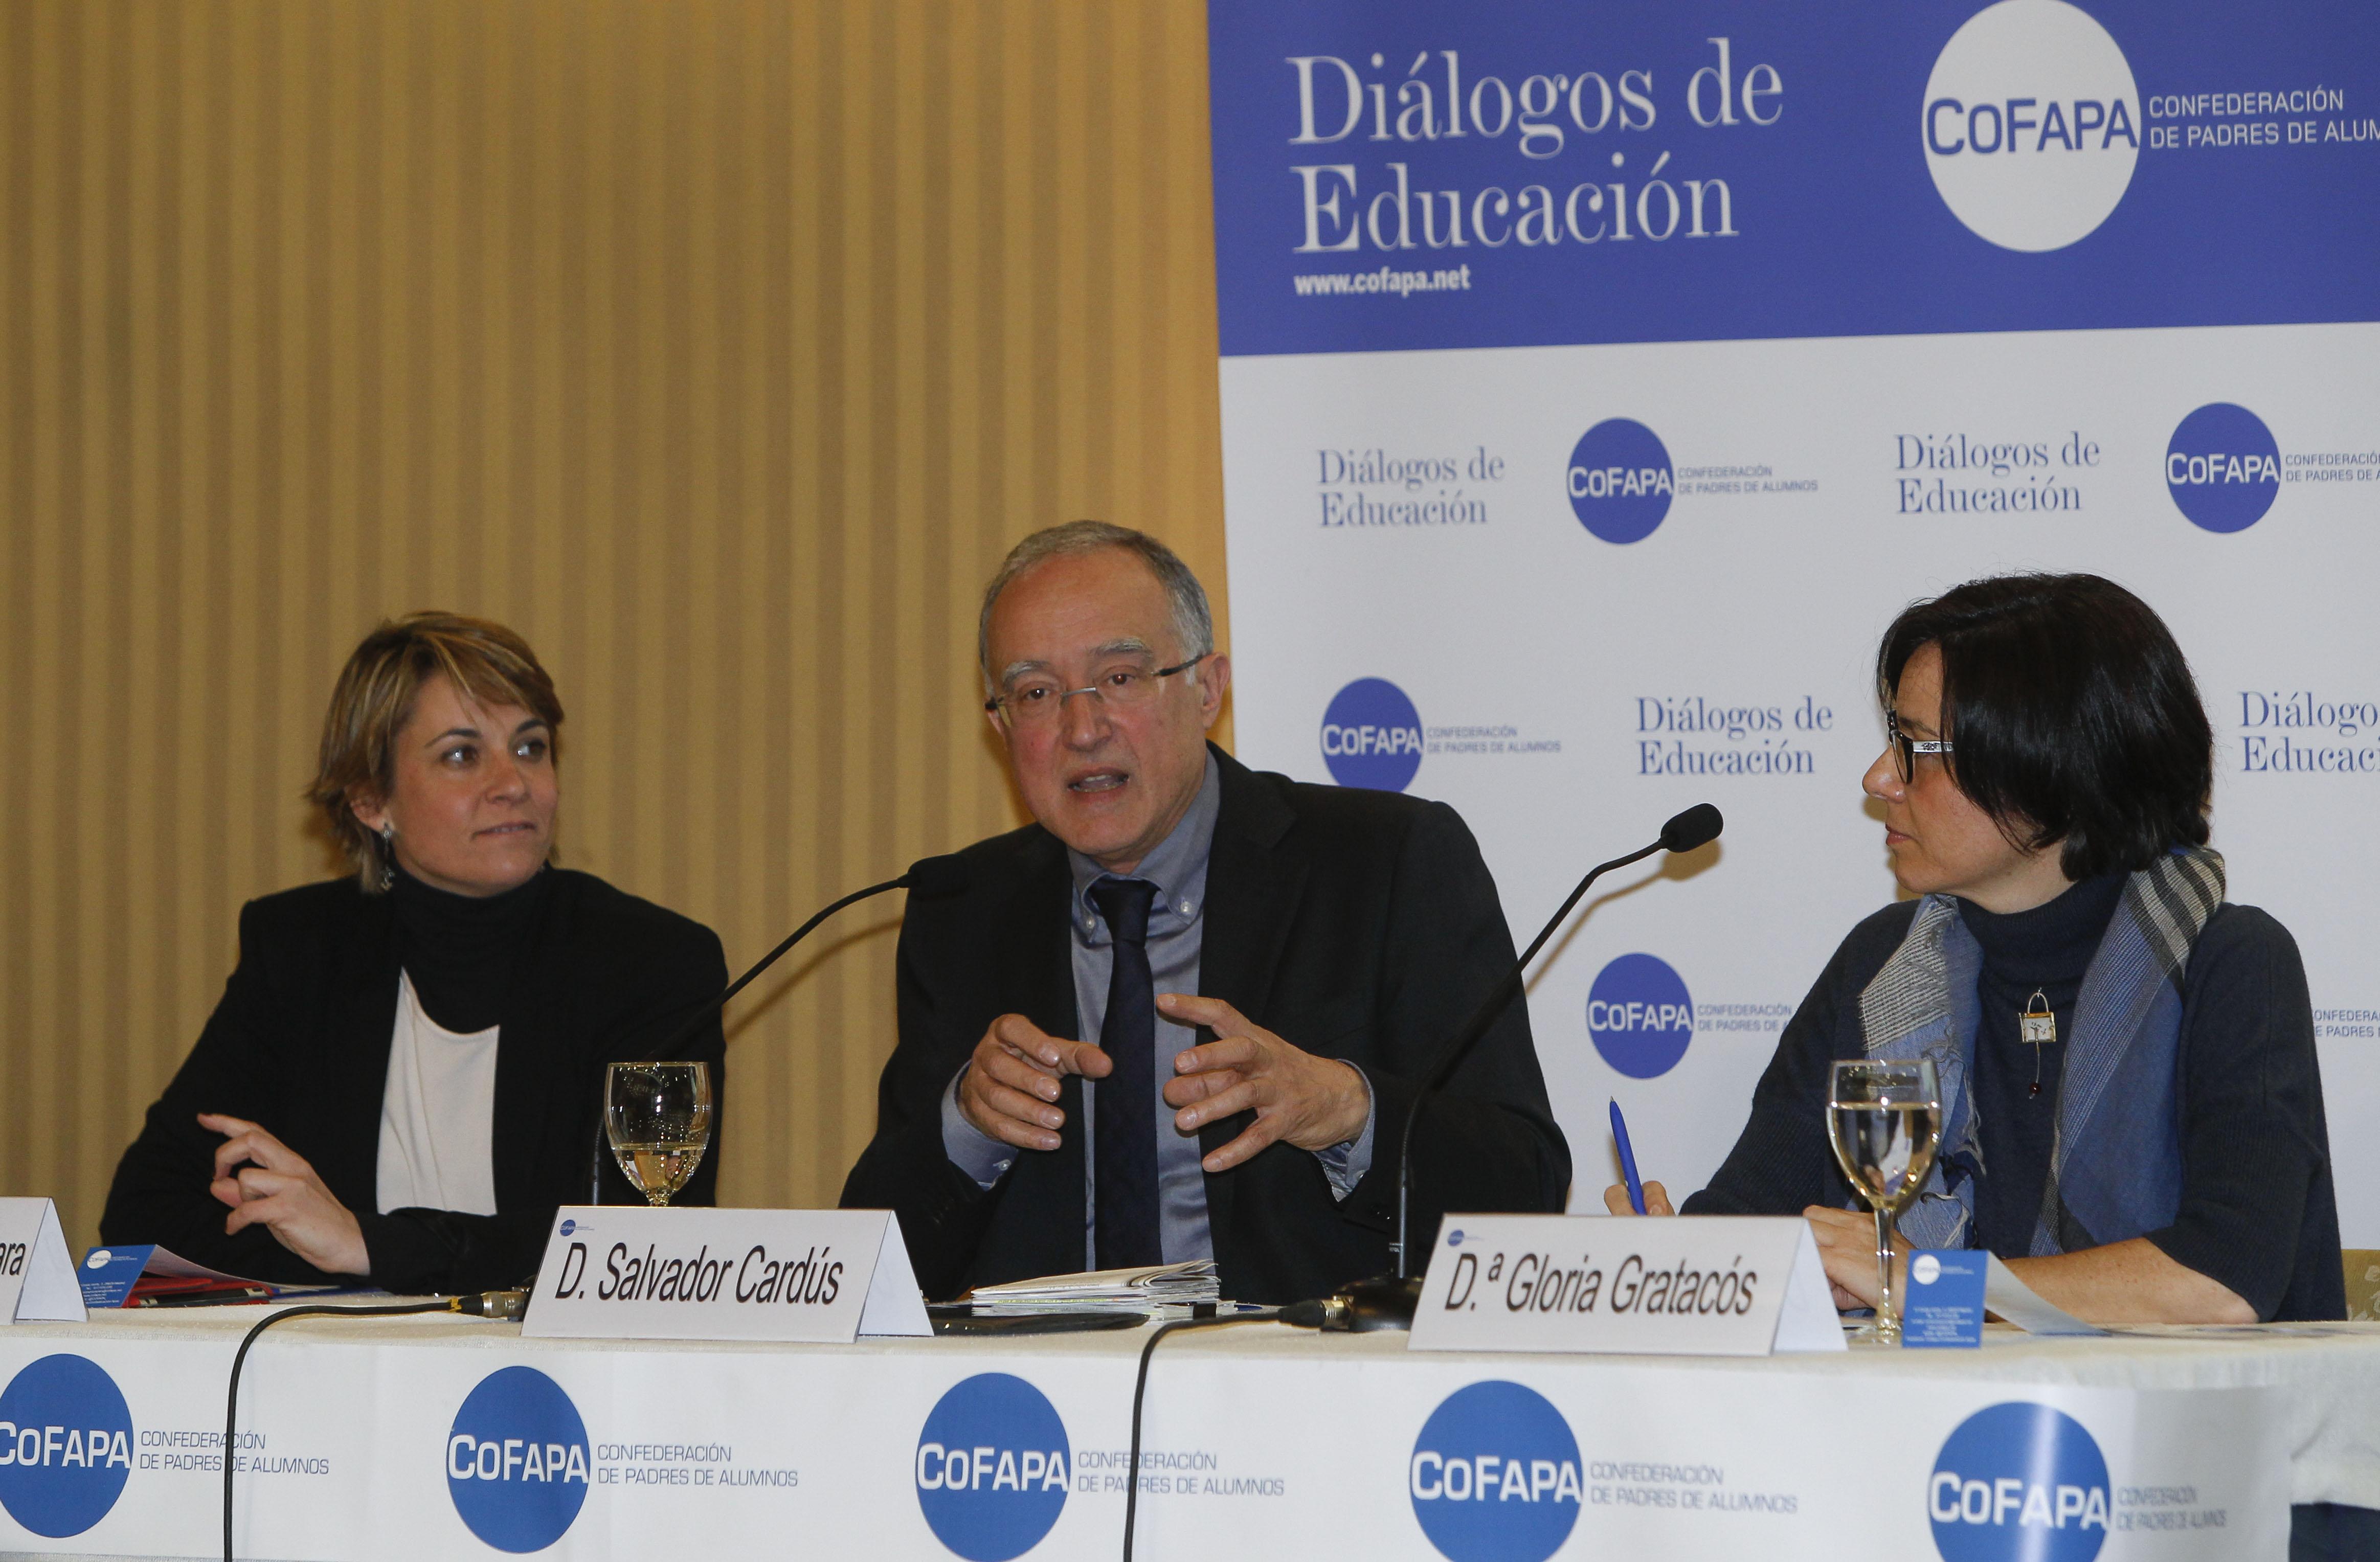 17 Diálogo de Educación de Cofapa con Salvador Cardús